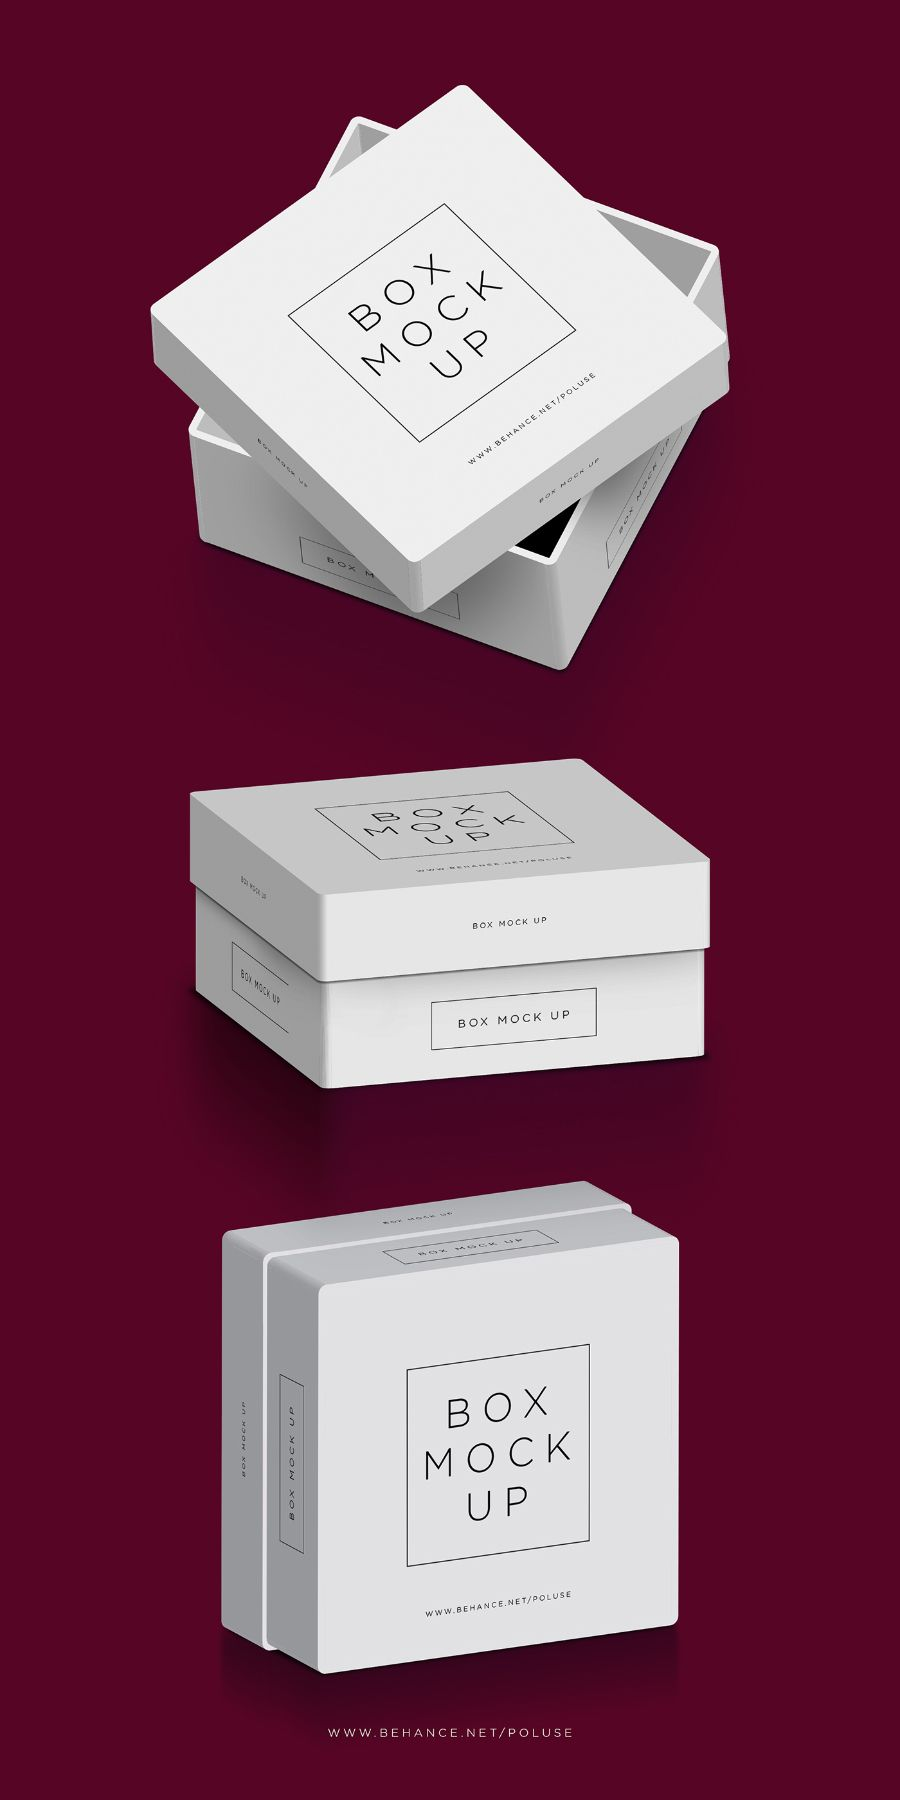 Download Free Psd Packaging Box Mockup Free Design Resources Design Mockup Free Box Mockup Free Packaging Mockup